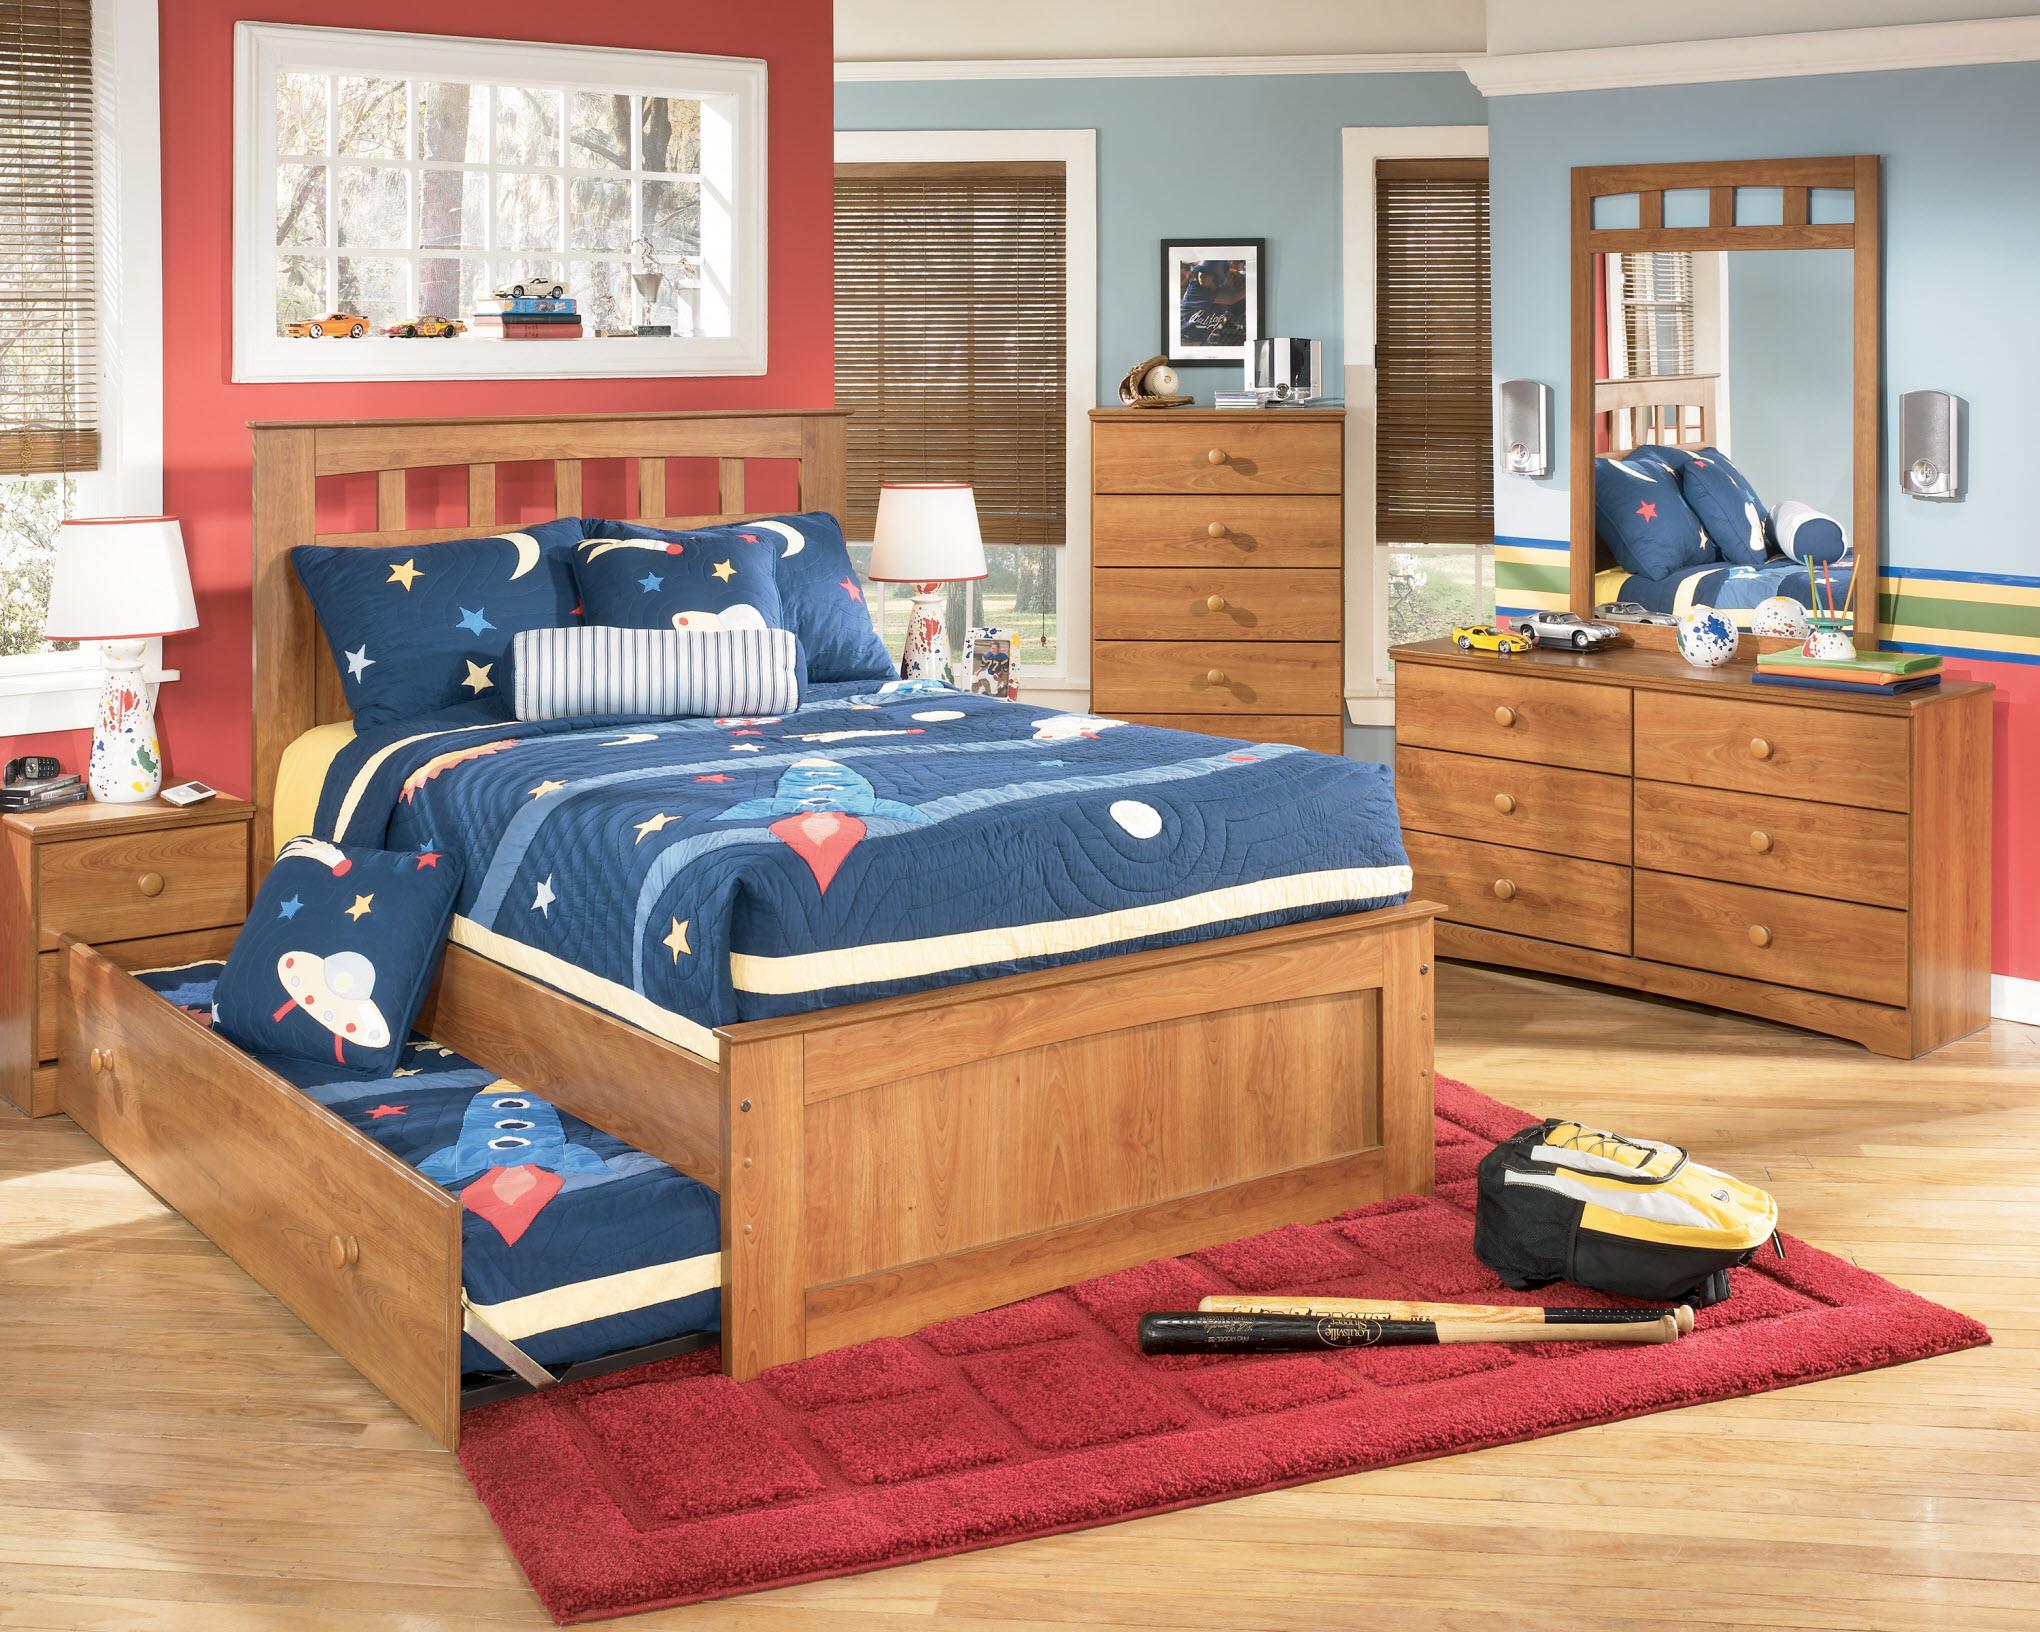 boys bedroom furniture ideas photo - 10